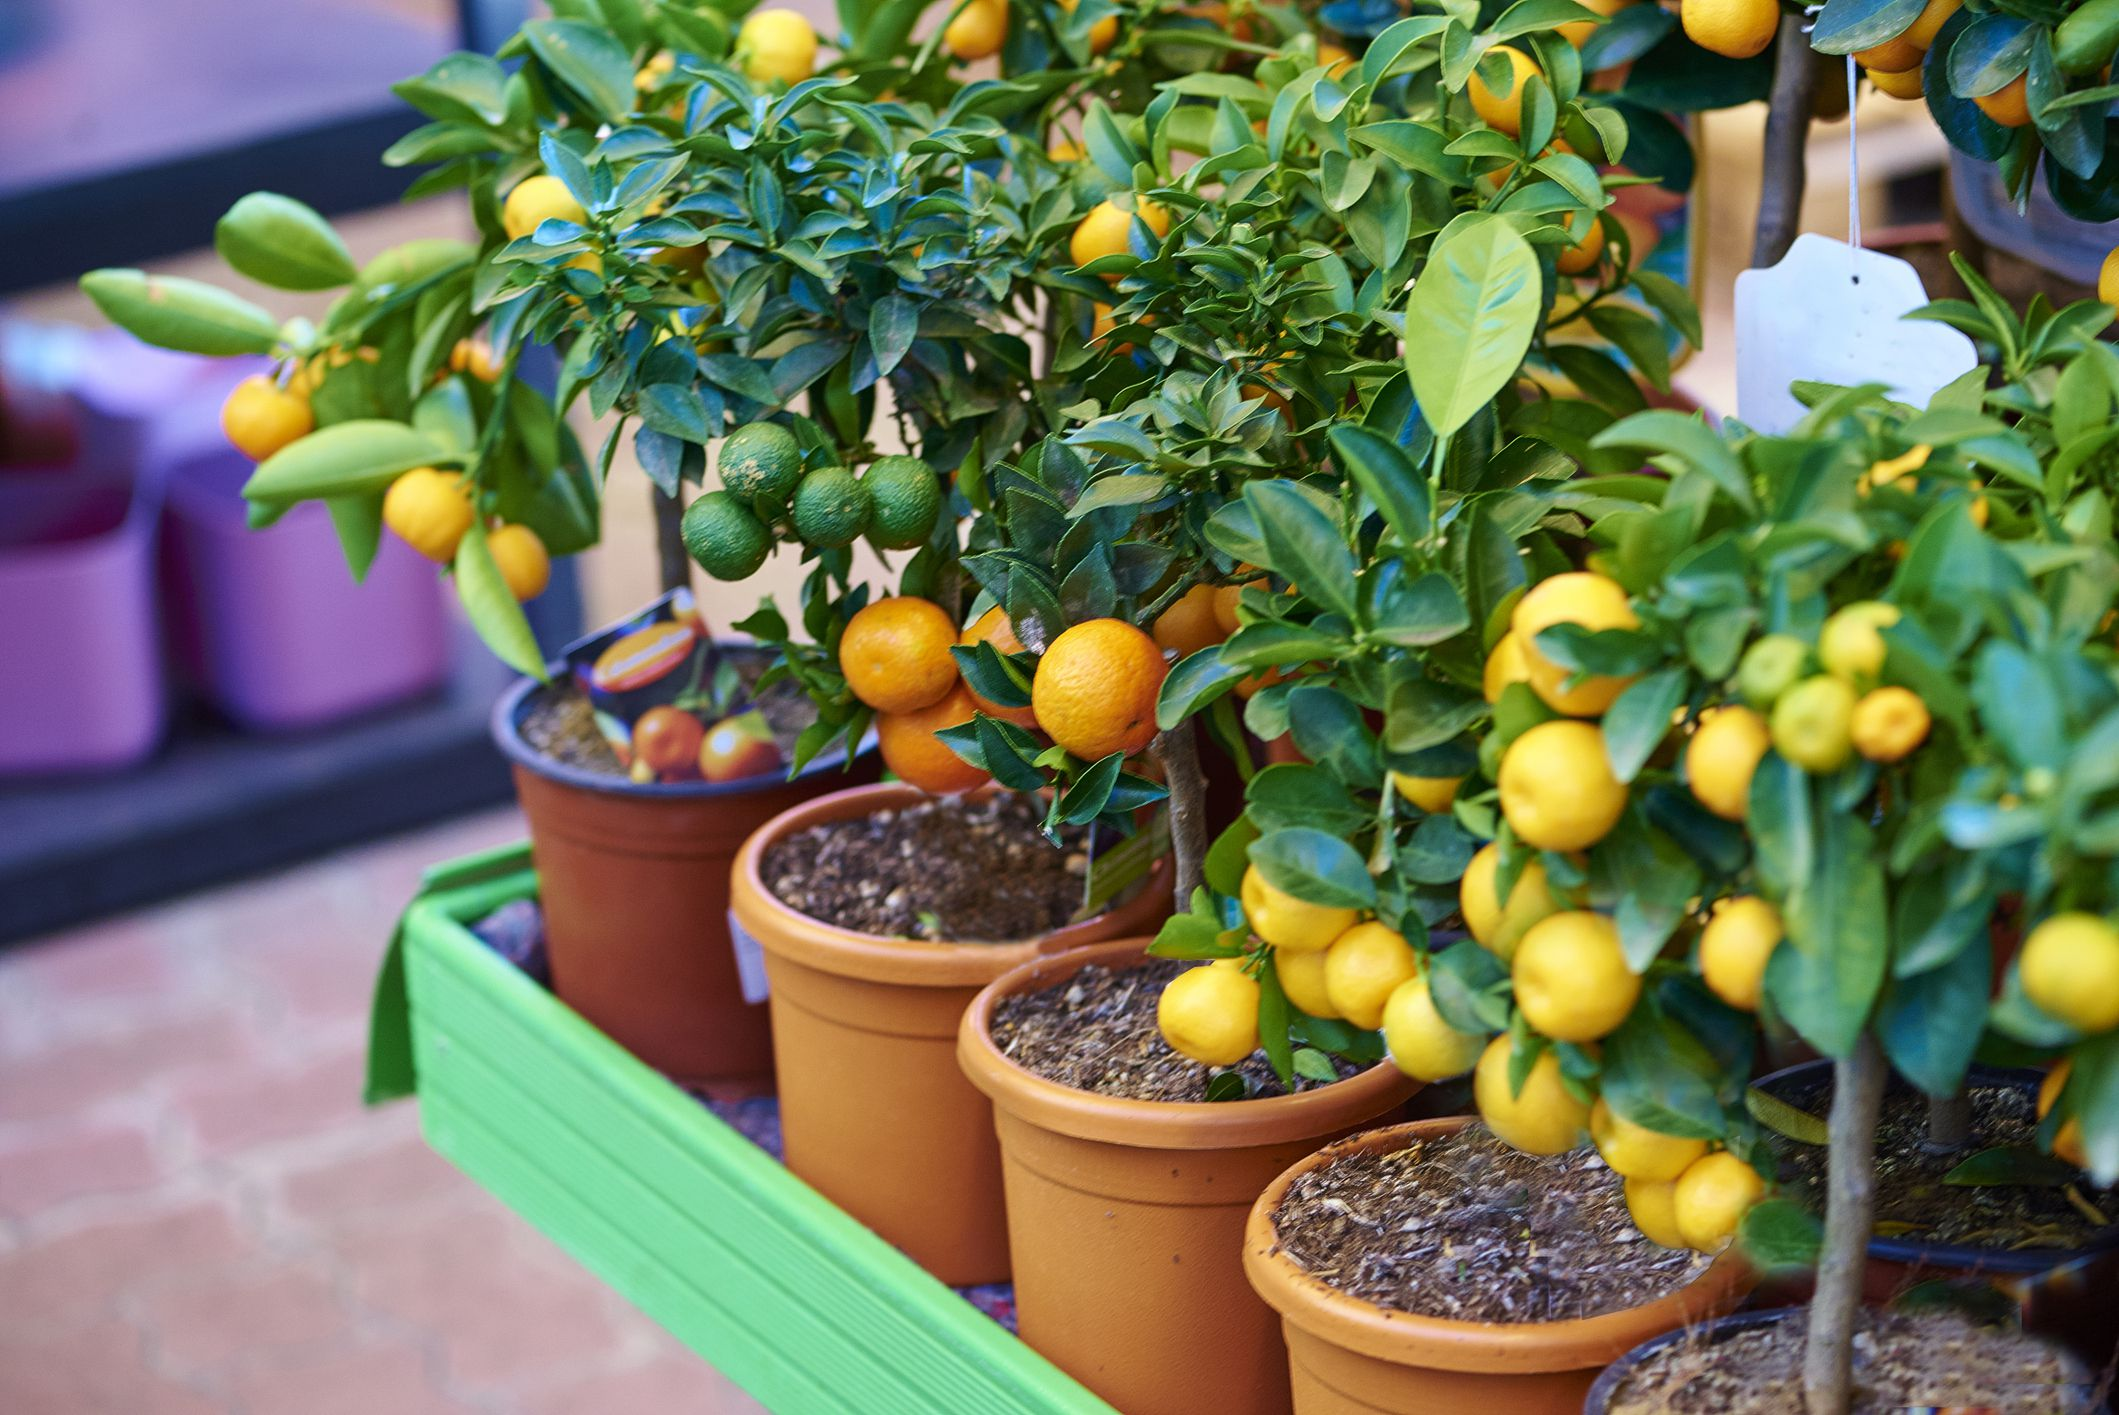 Growing Dwarf Citrus Trees